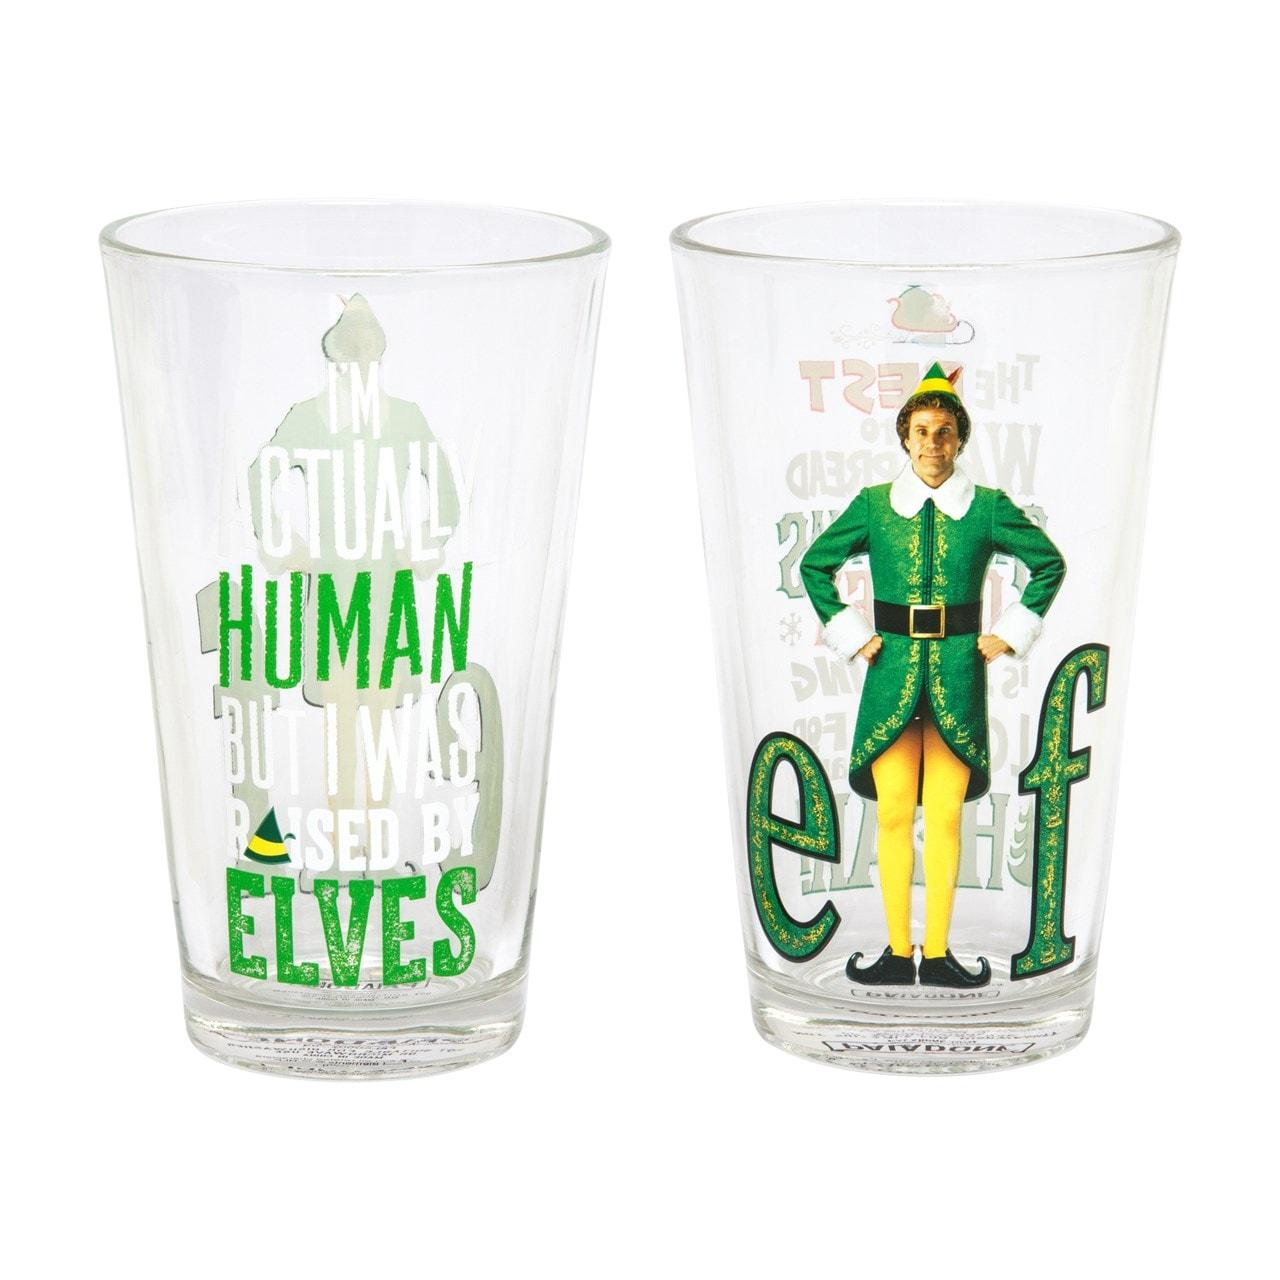 Set of 2 Elf Glasses: Large Glass Gift Set - 2